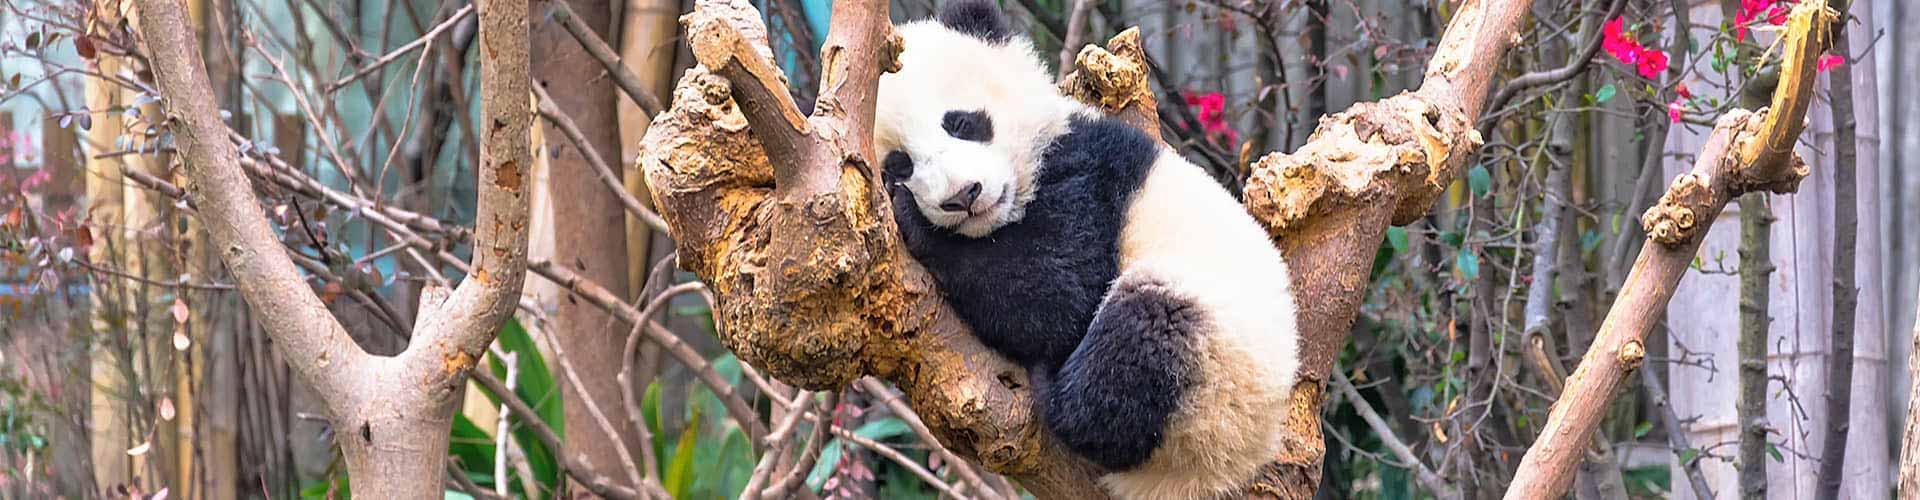 Panda Country & Yangtze River Cruise